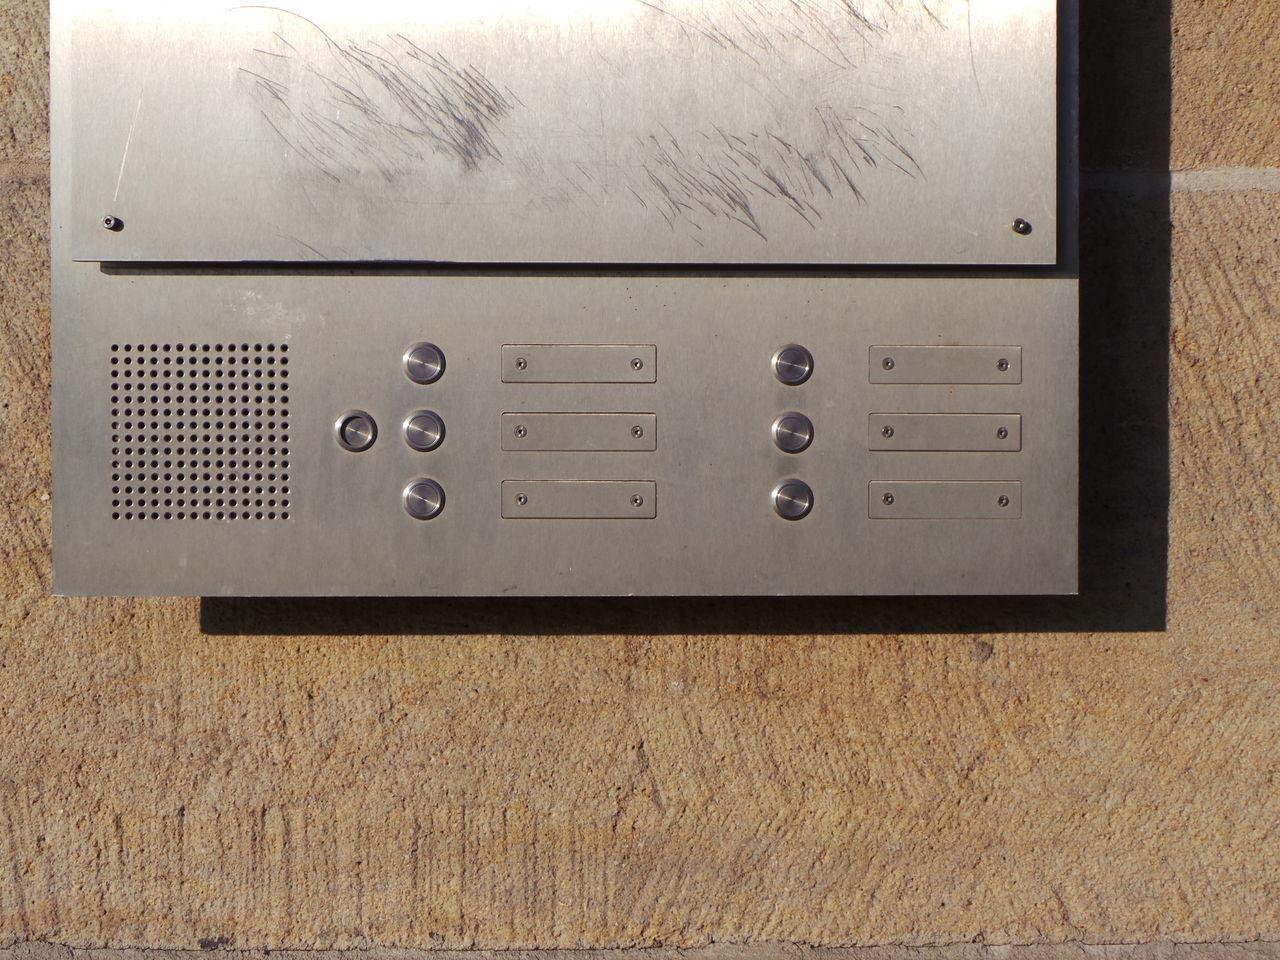 Communication Gegensprechanlage Intercom Interphone Klingel Klingelbrett Klingelschild Kommunikation Silber Silver  Wall Wand